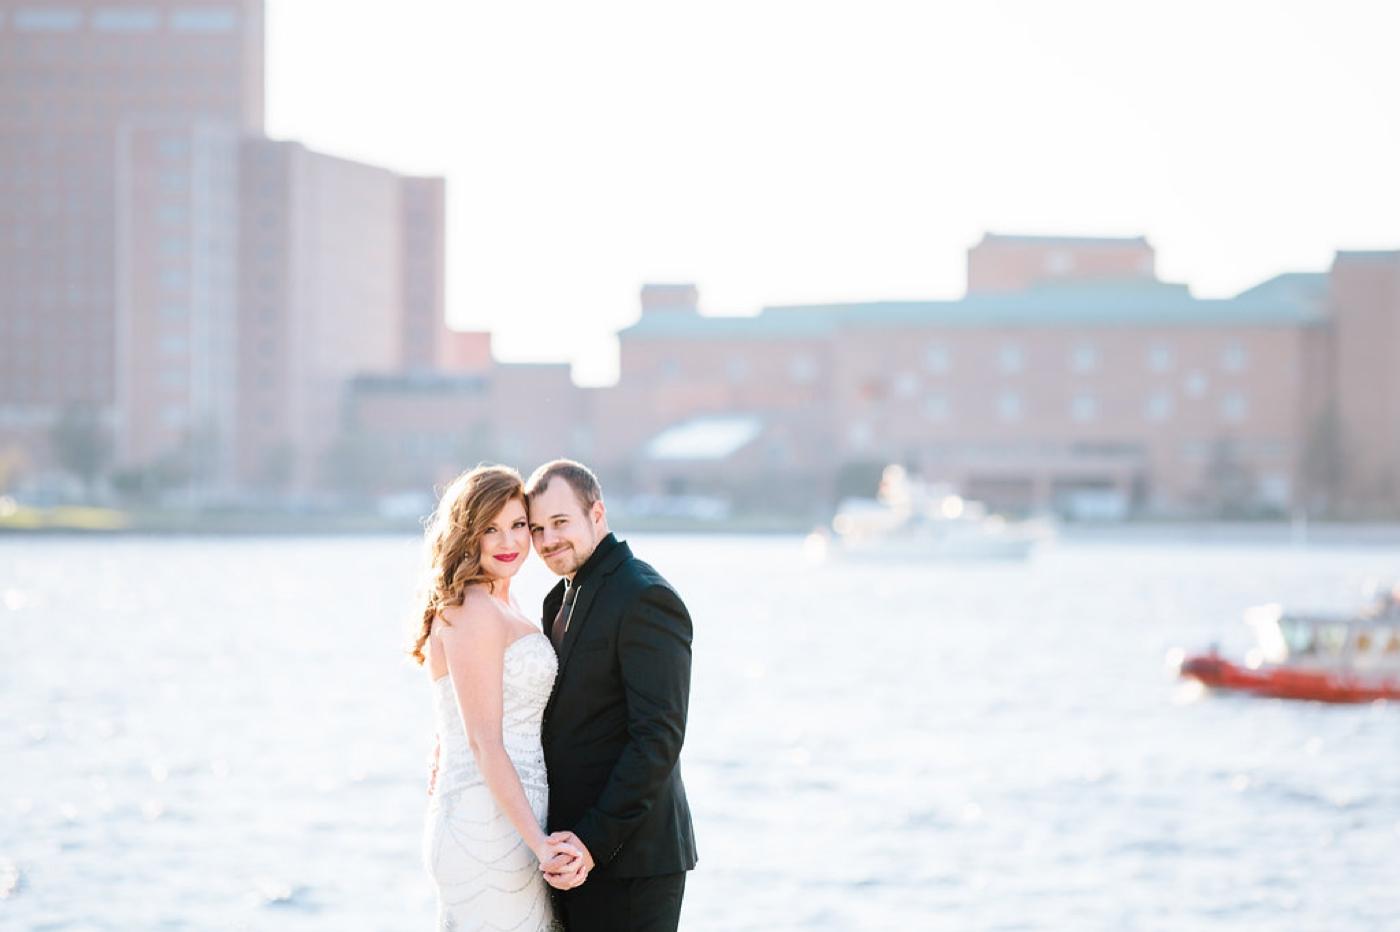 chicago-fine-art-wedding-photography-burnette8